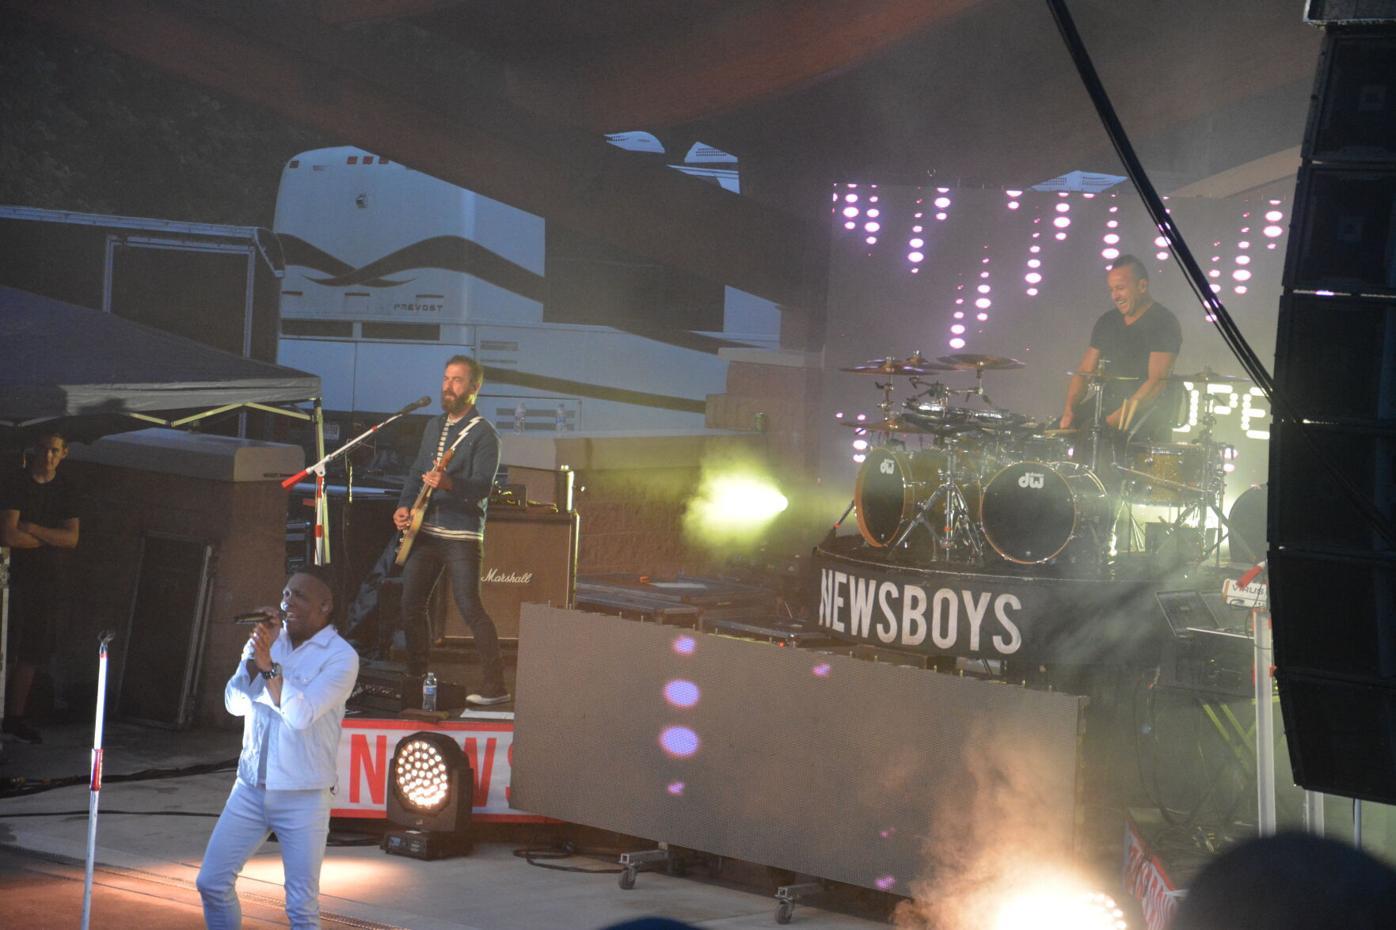 Newsboys performing